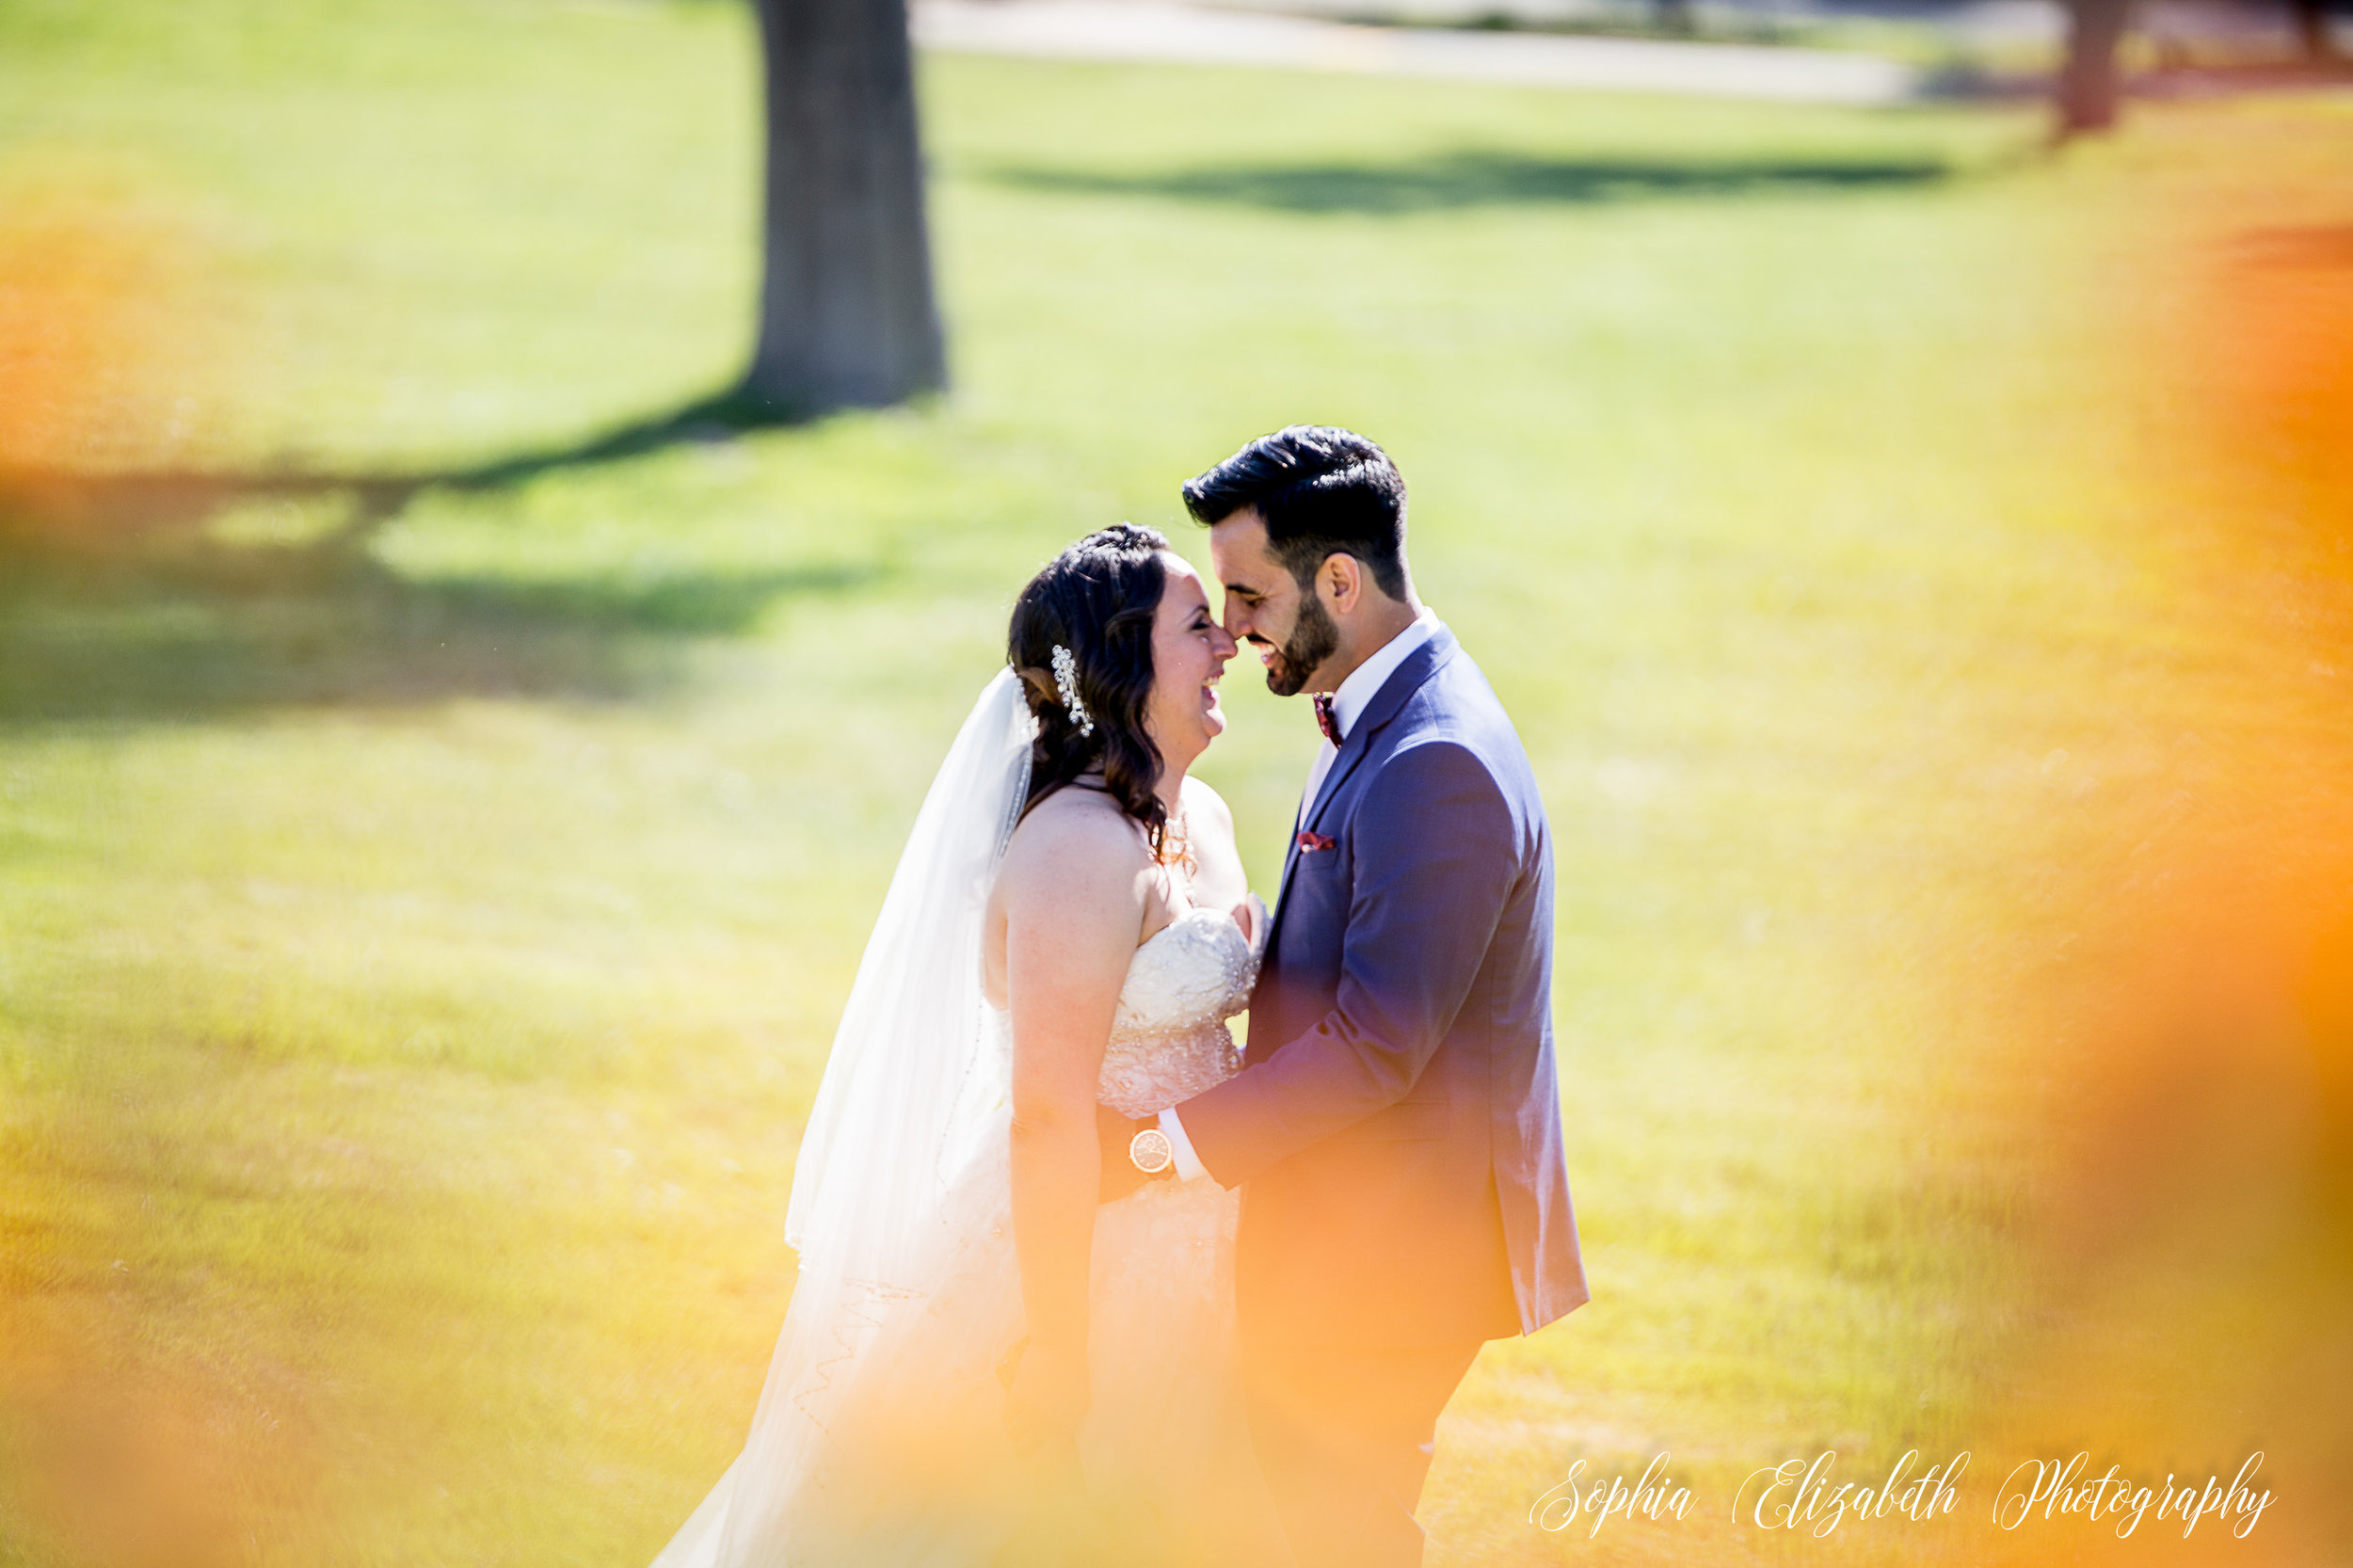 big-oaks-ranch-wedding-san-diego-california-wedding-photographer- (5 of 5).jpg